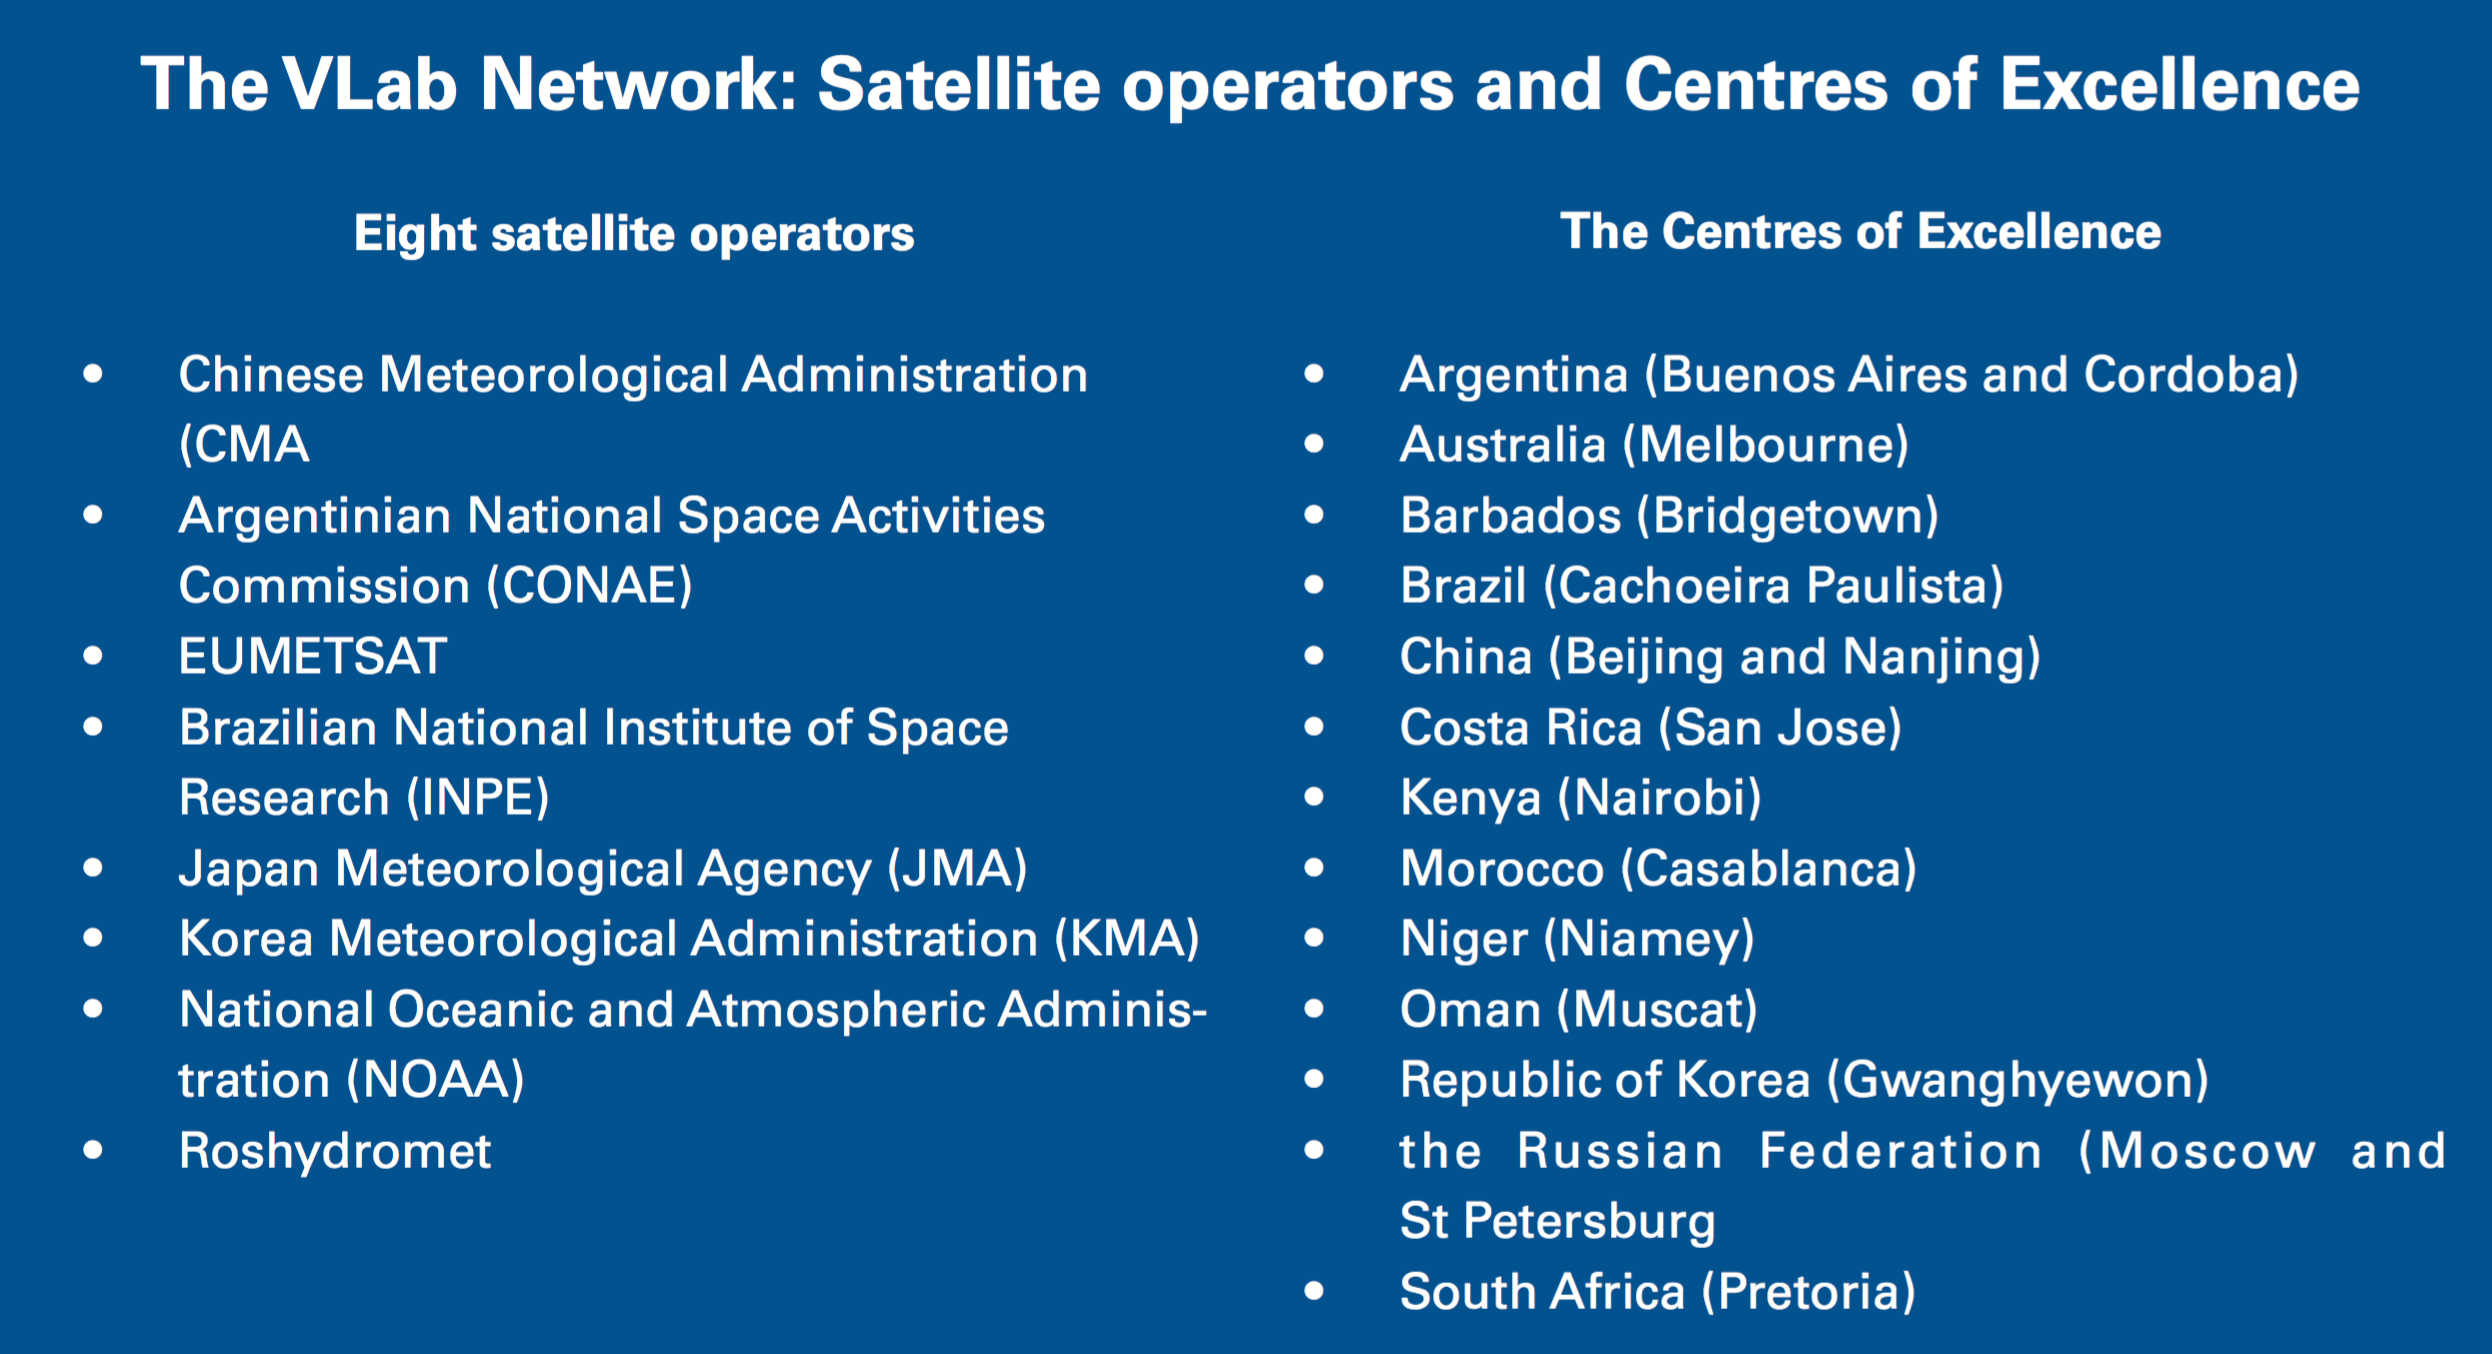 The VLab Network